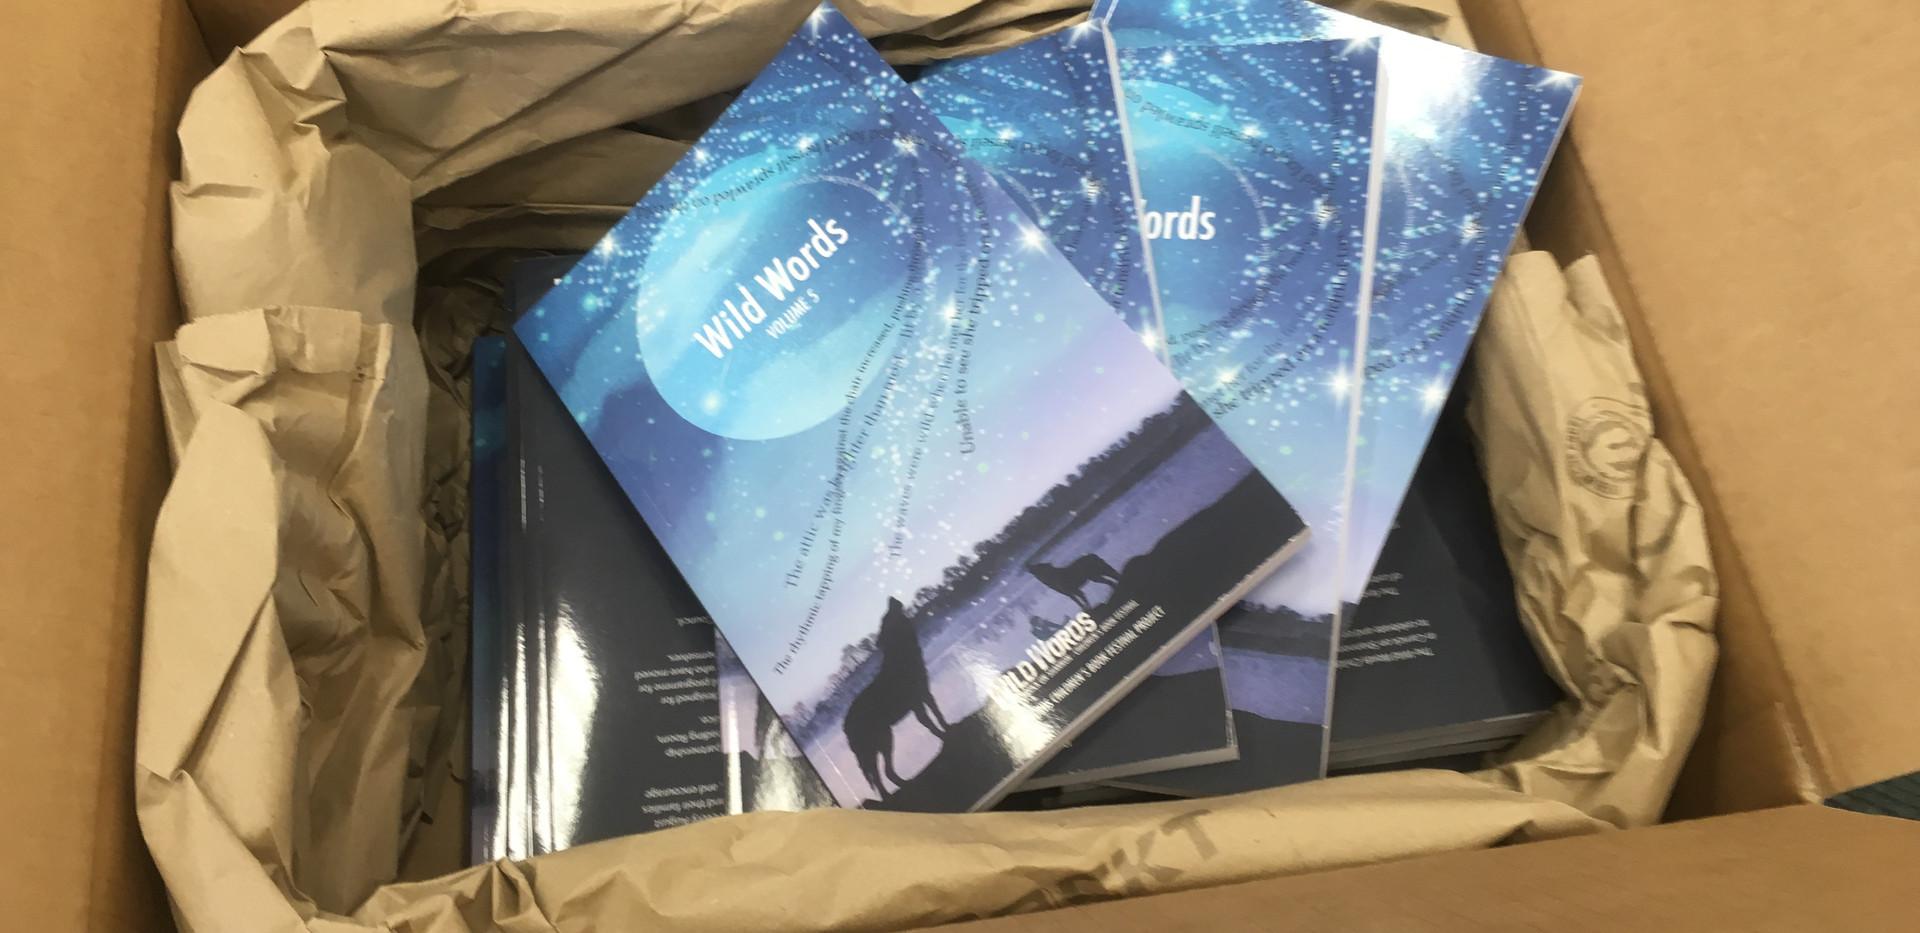 The books arrive